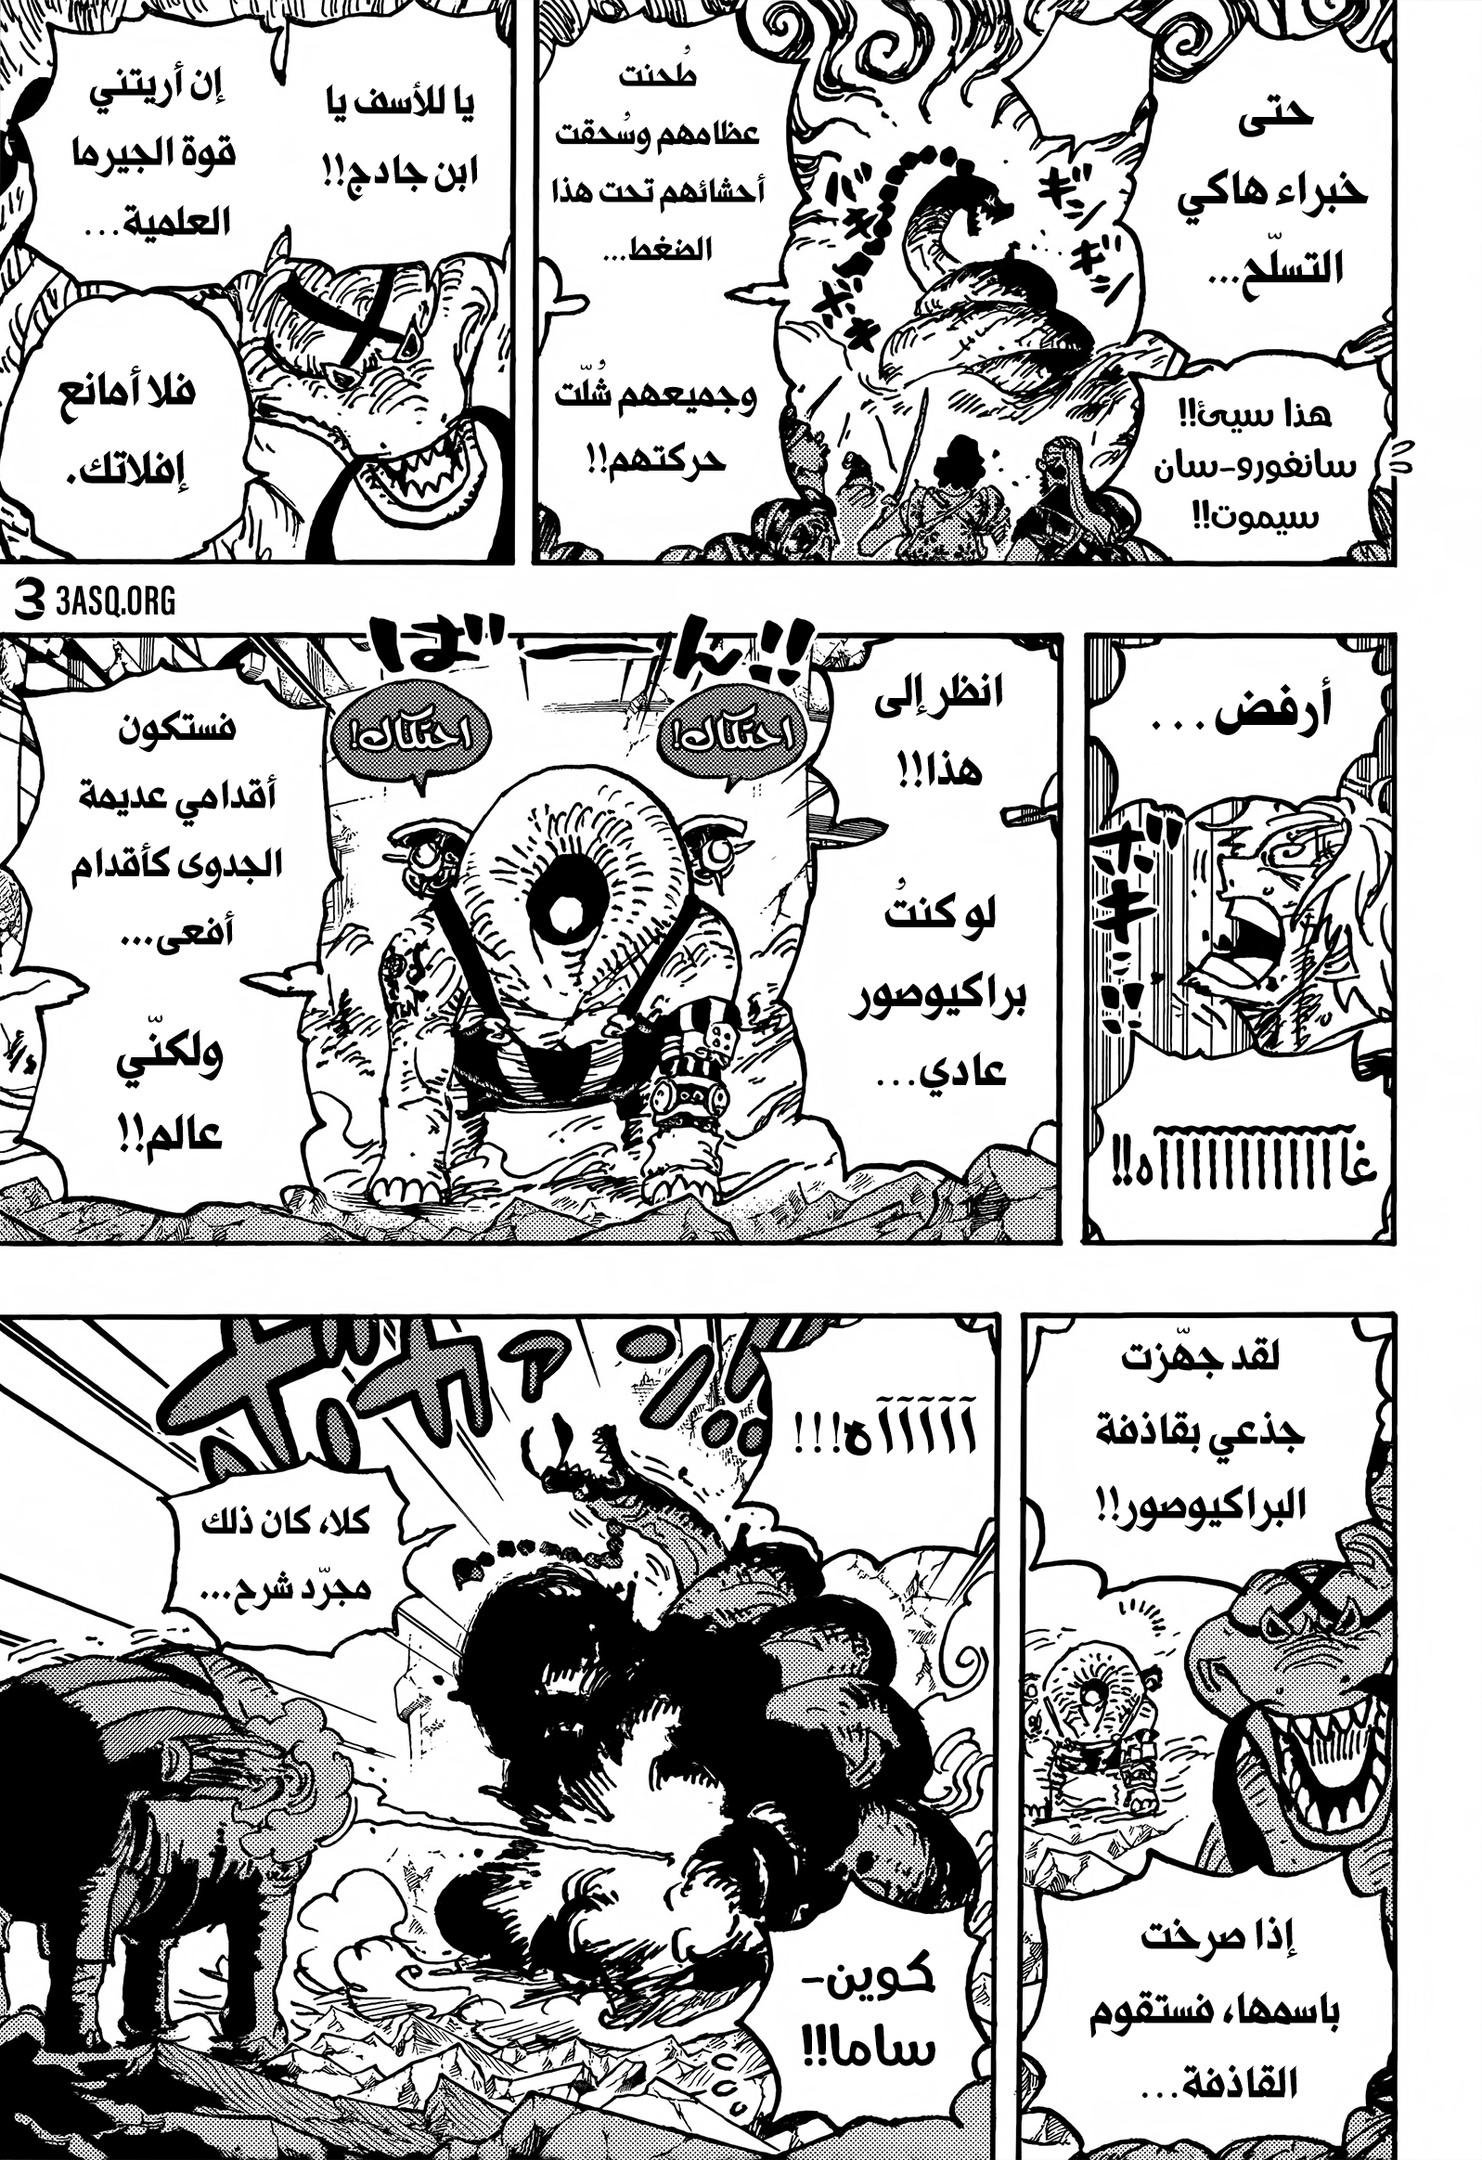 Arab One Piece 1028, image №15